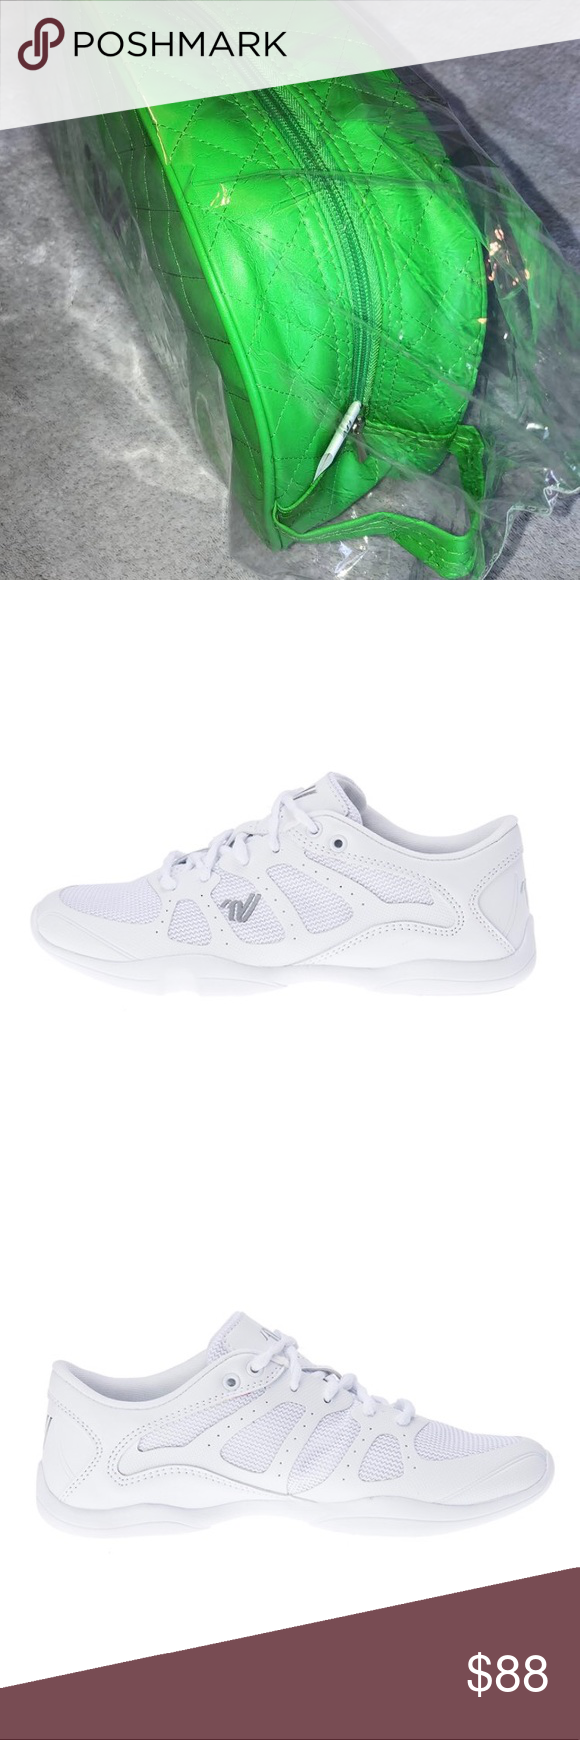 Varsity brand A41 Cheerleading Shoes 8